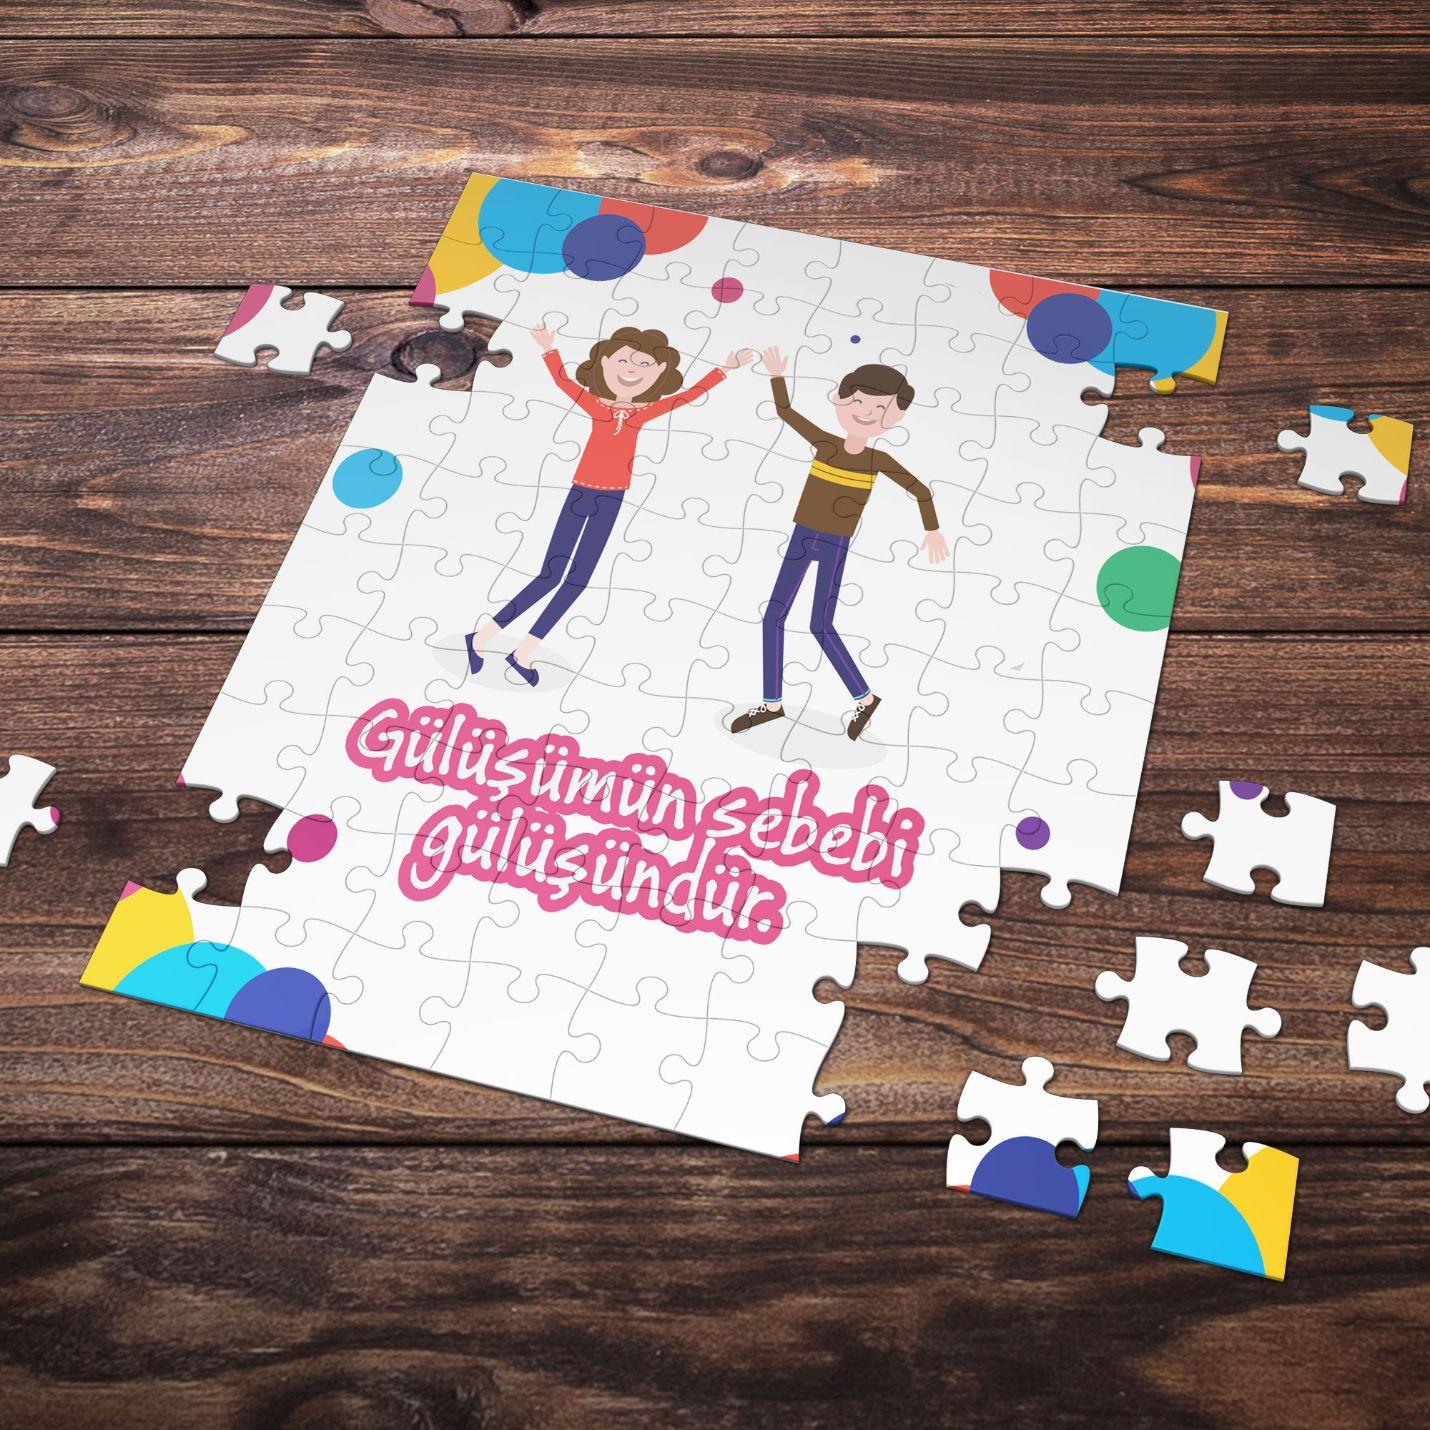 99 Parça Romantik Tasarımlı Puzzle Yapboz No17